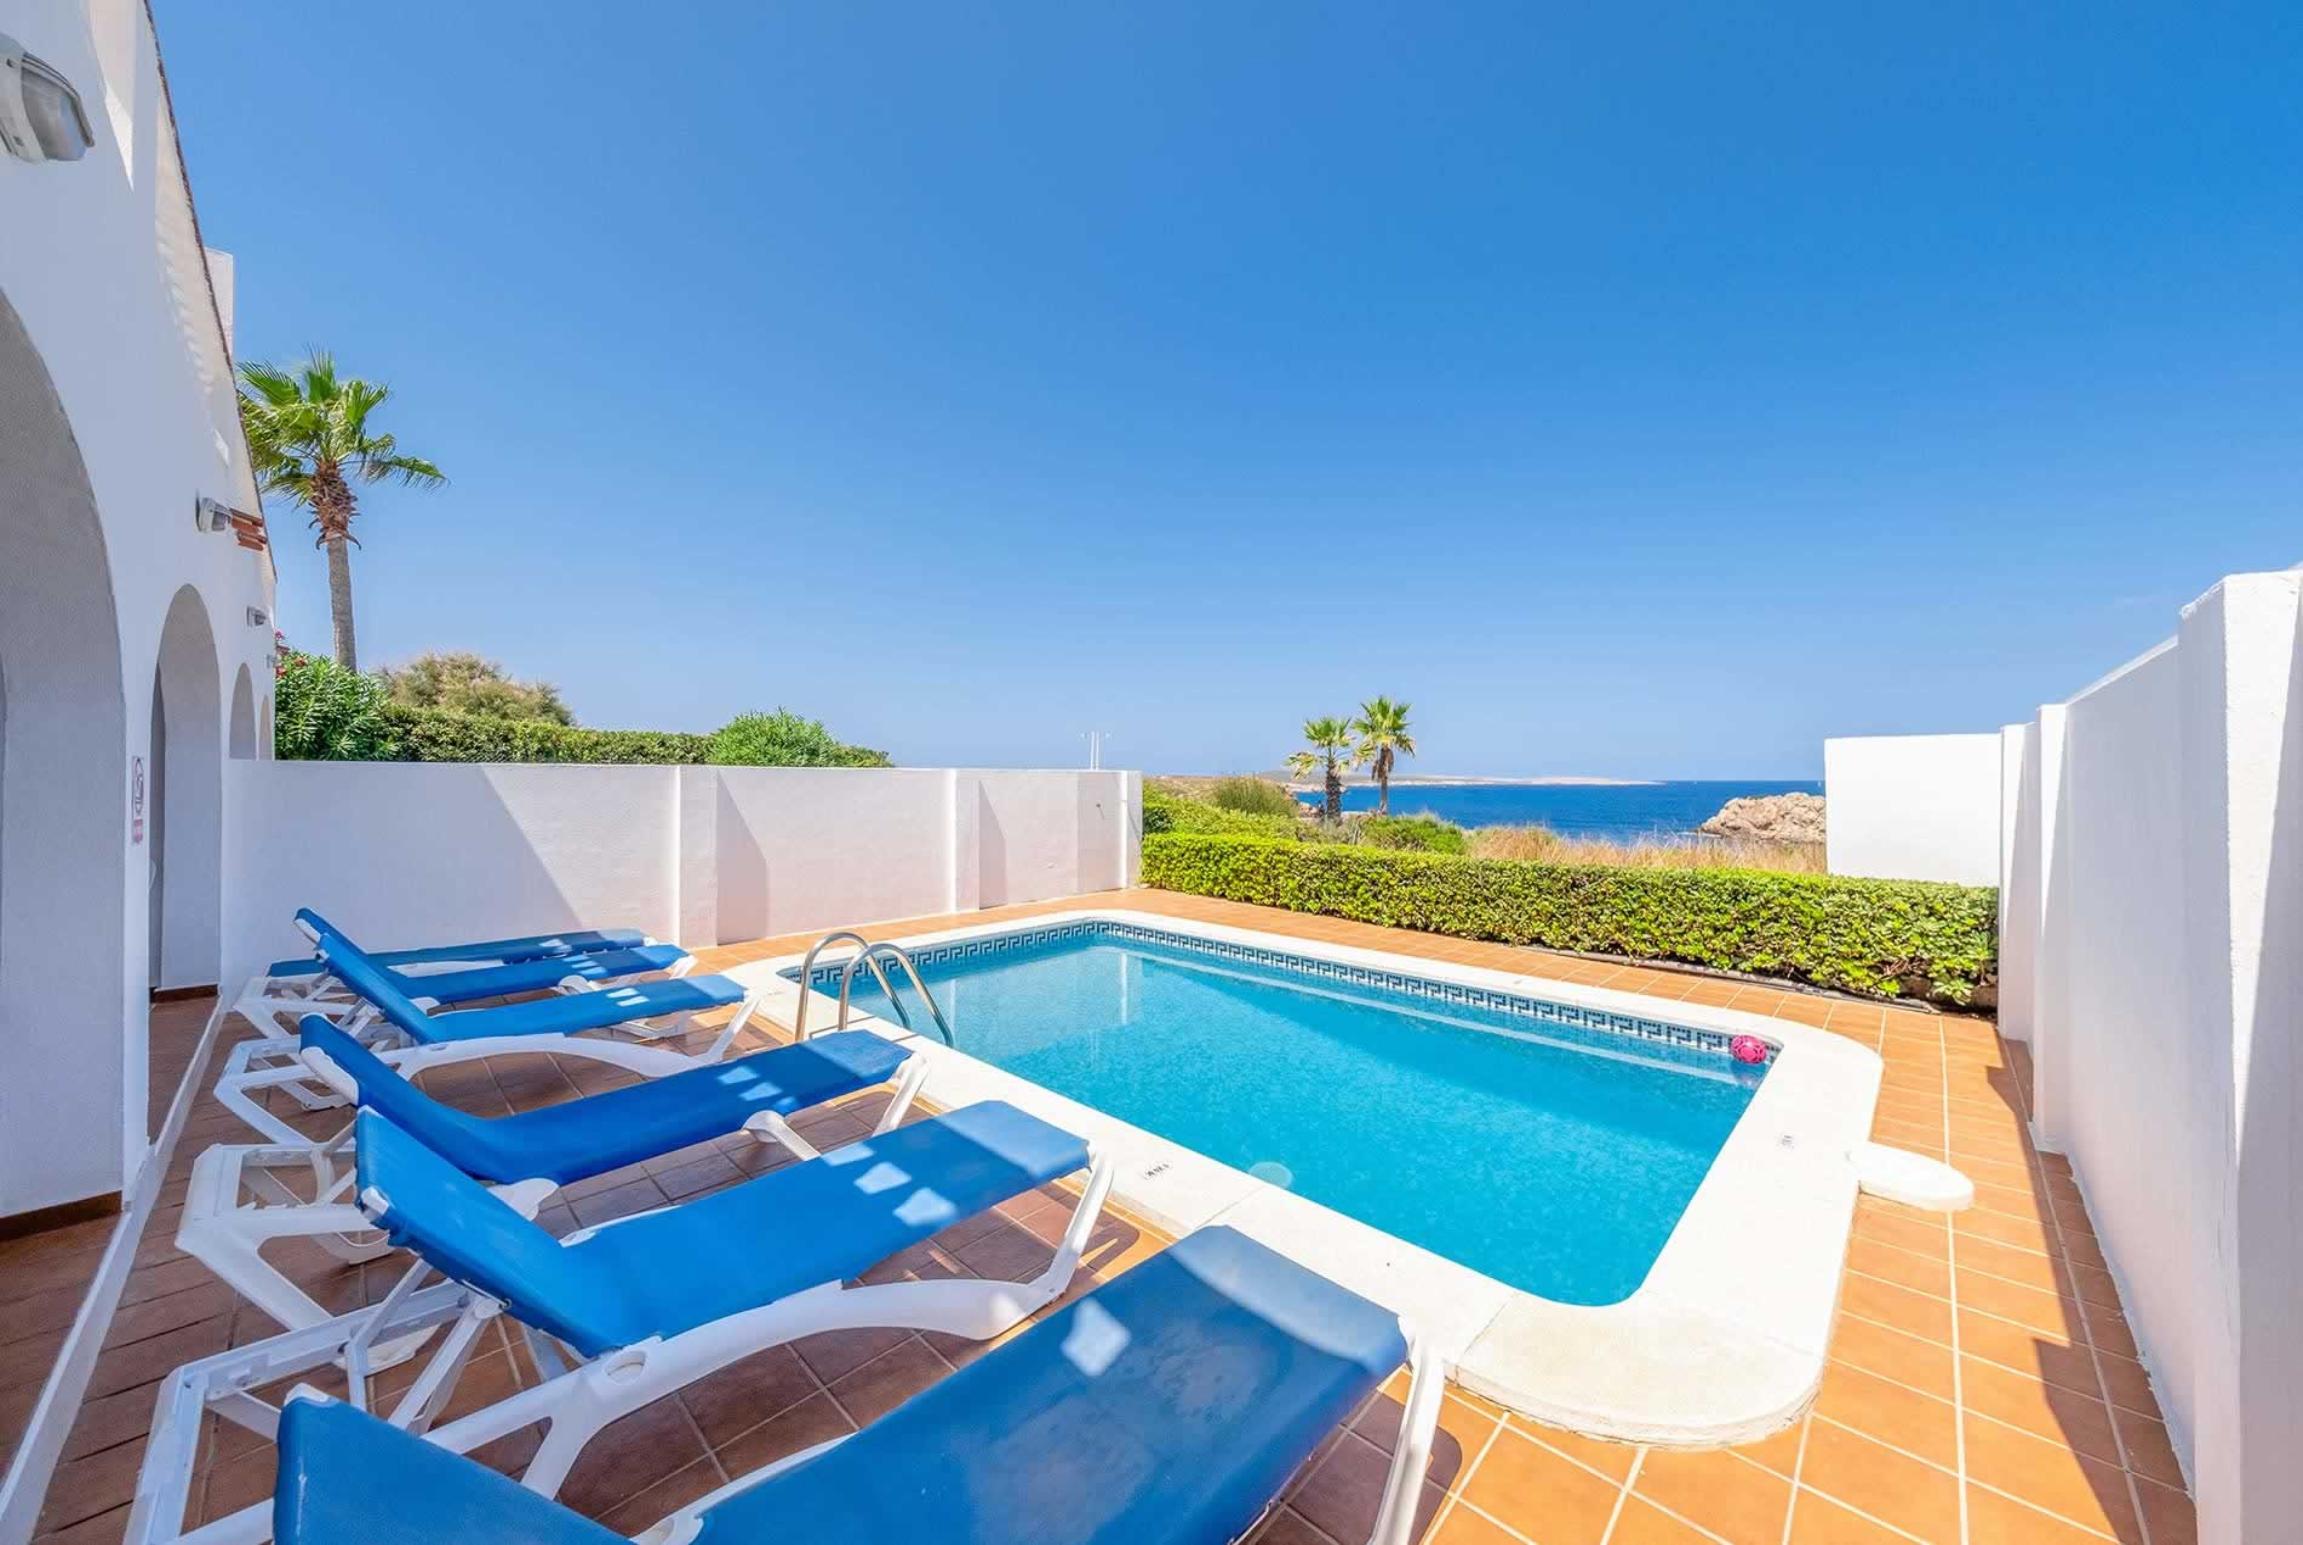 Ferienhaus Bellavista II (2654270), Arenal De'N Castell, Menorca, Balearische Inseln, Spanien, Bild 2